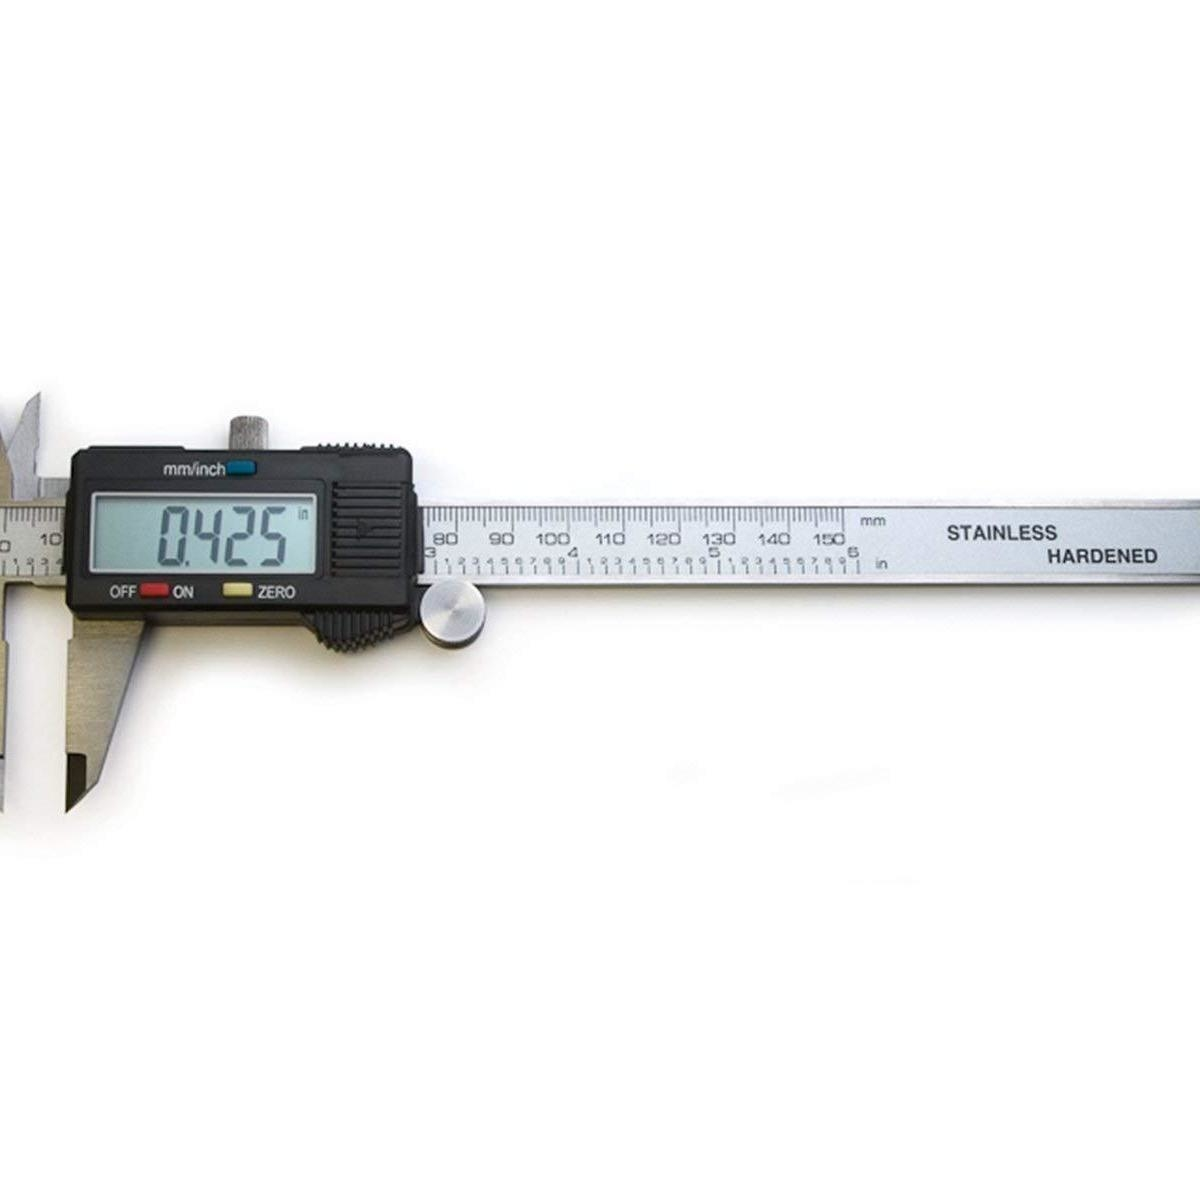 LCD Screen Digital Caliper 6 inch